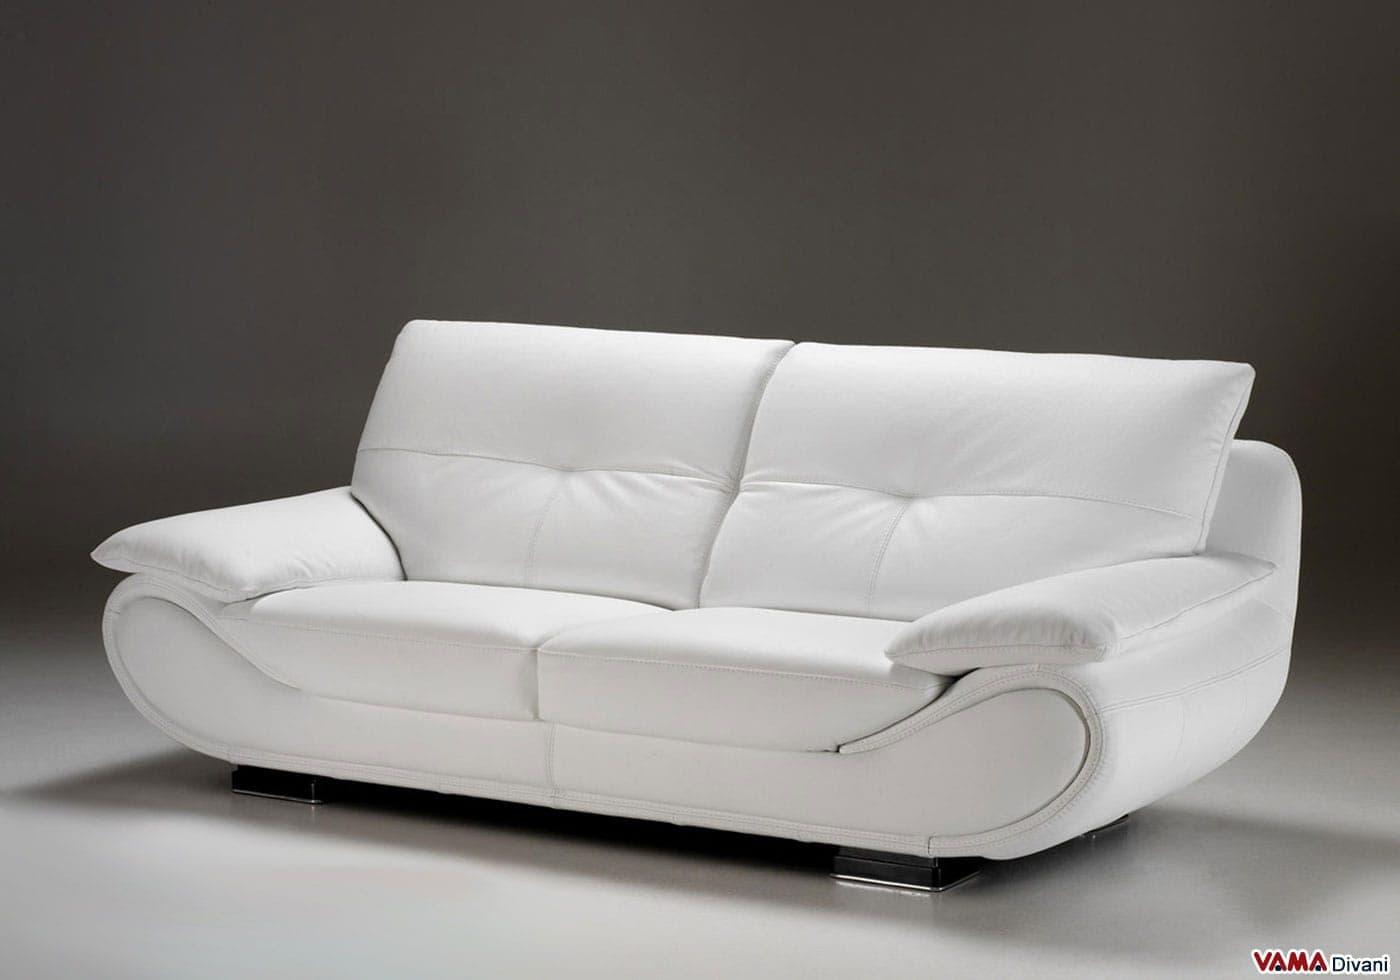 Divano in pelle moderno new zealand vama divani - Divano in pelle bianco ...